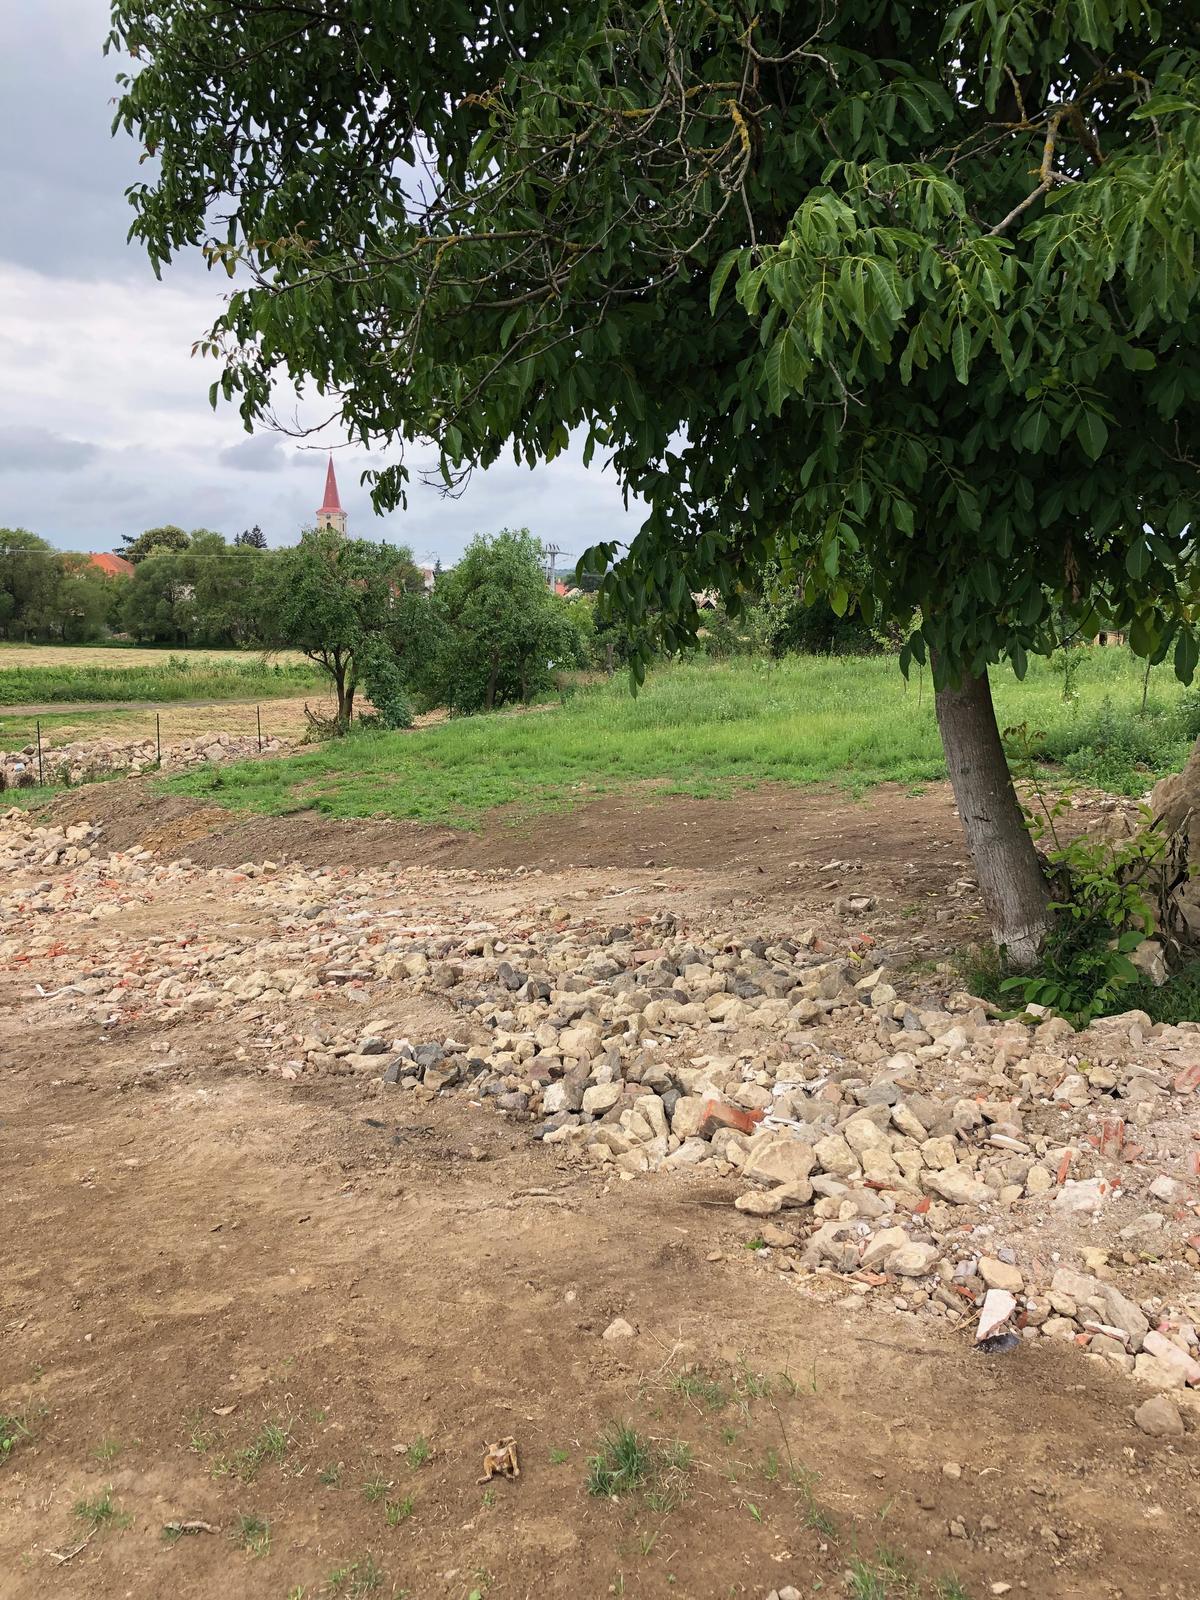 HACIENDA NAPOLI SEBECHLEBY - prijazdova cesta vystitovana na 50cm kamenom